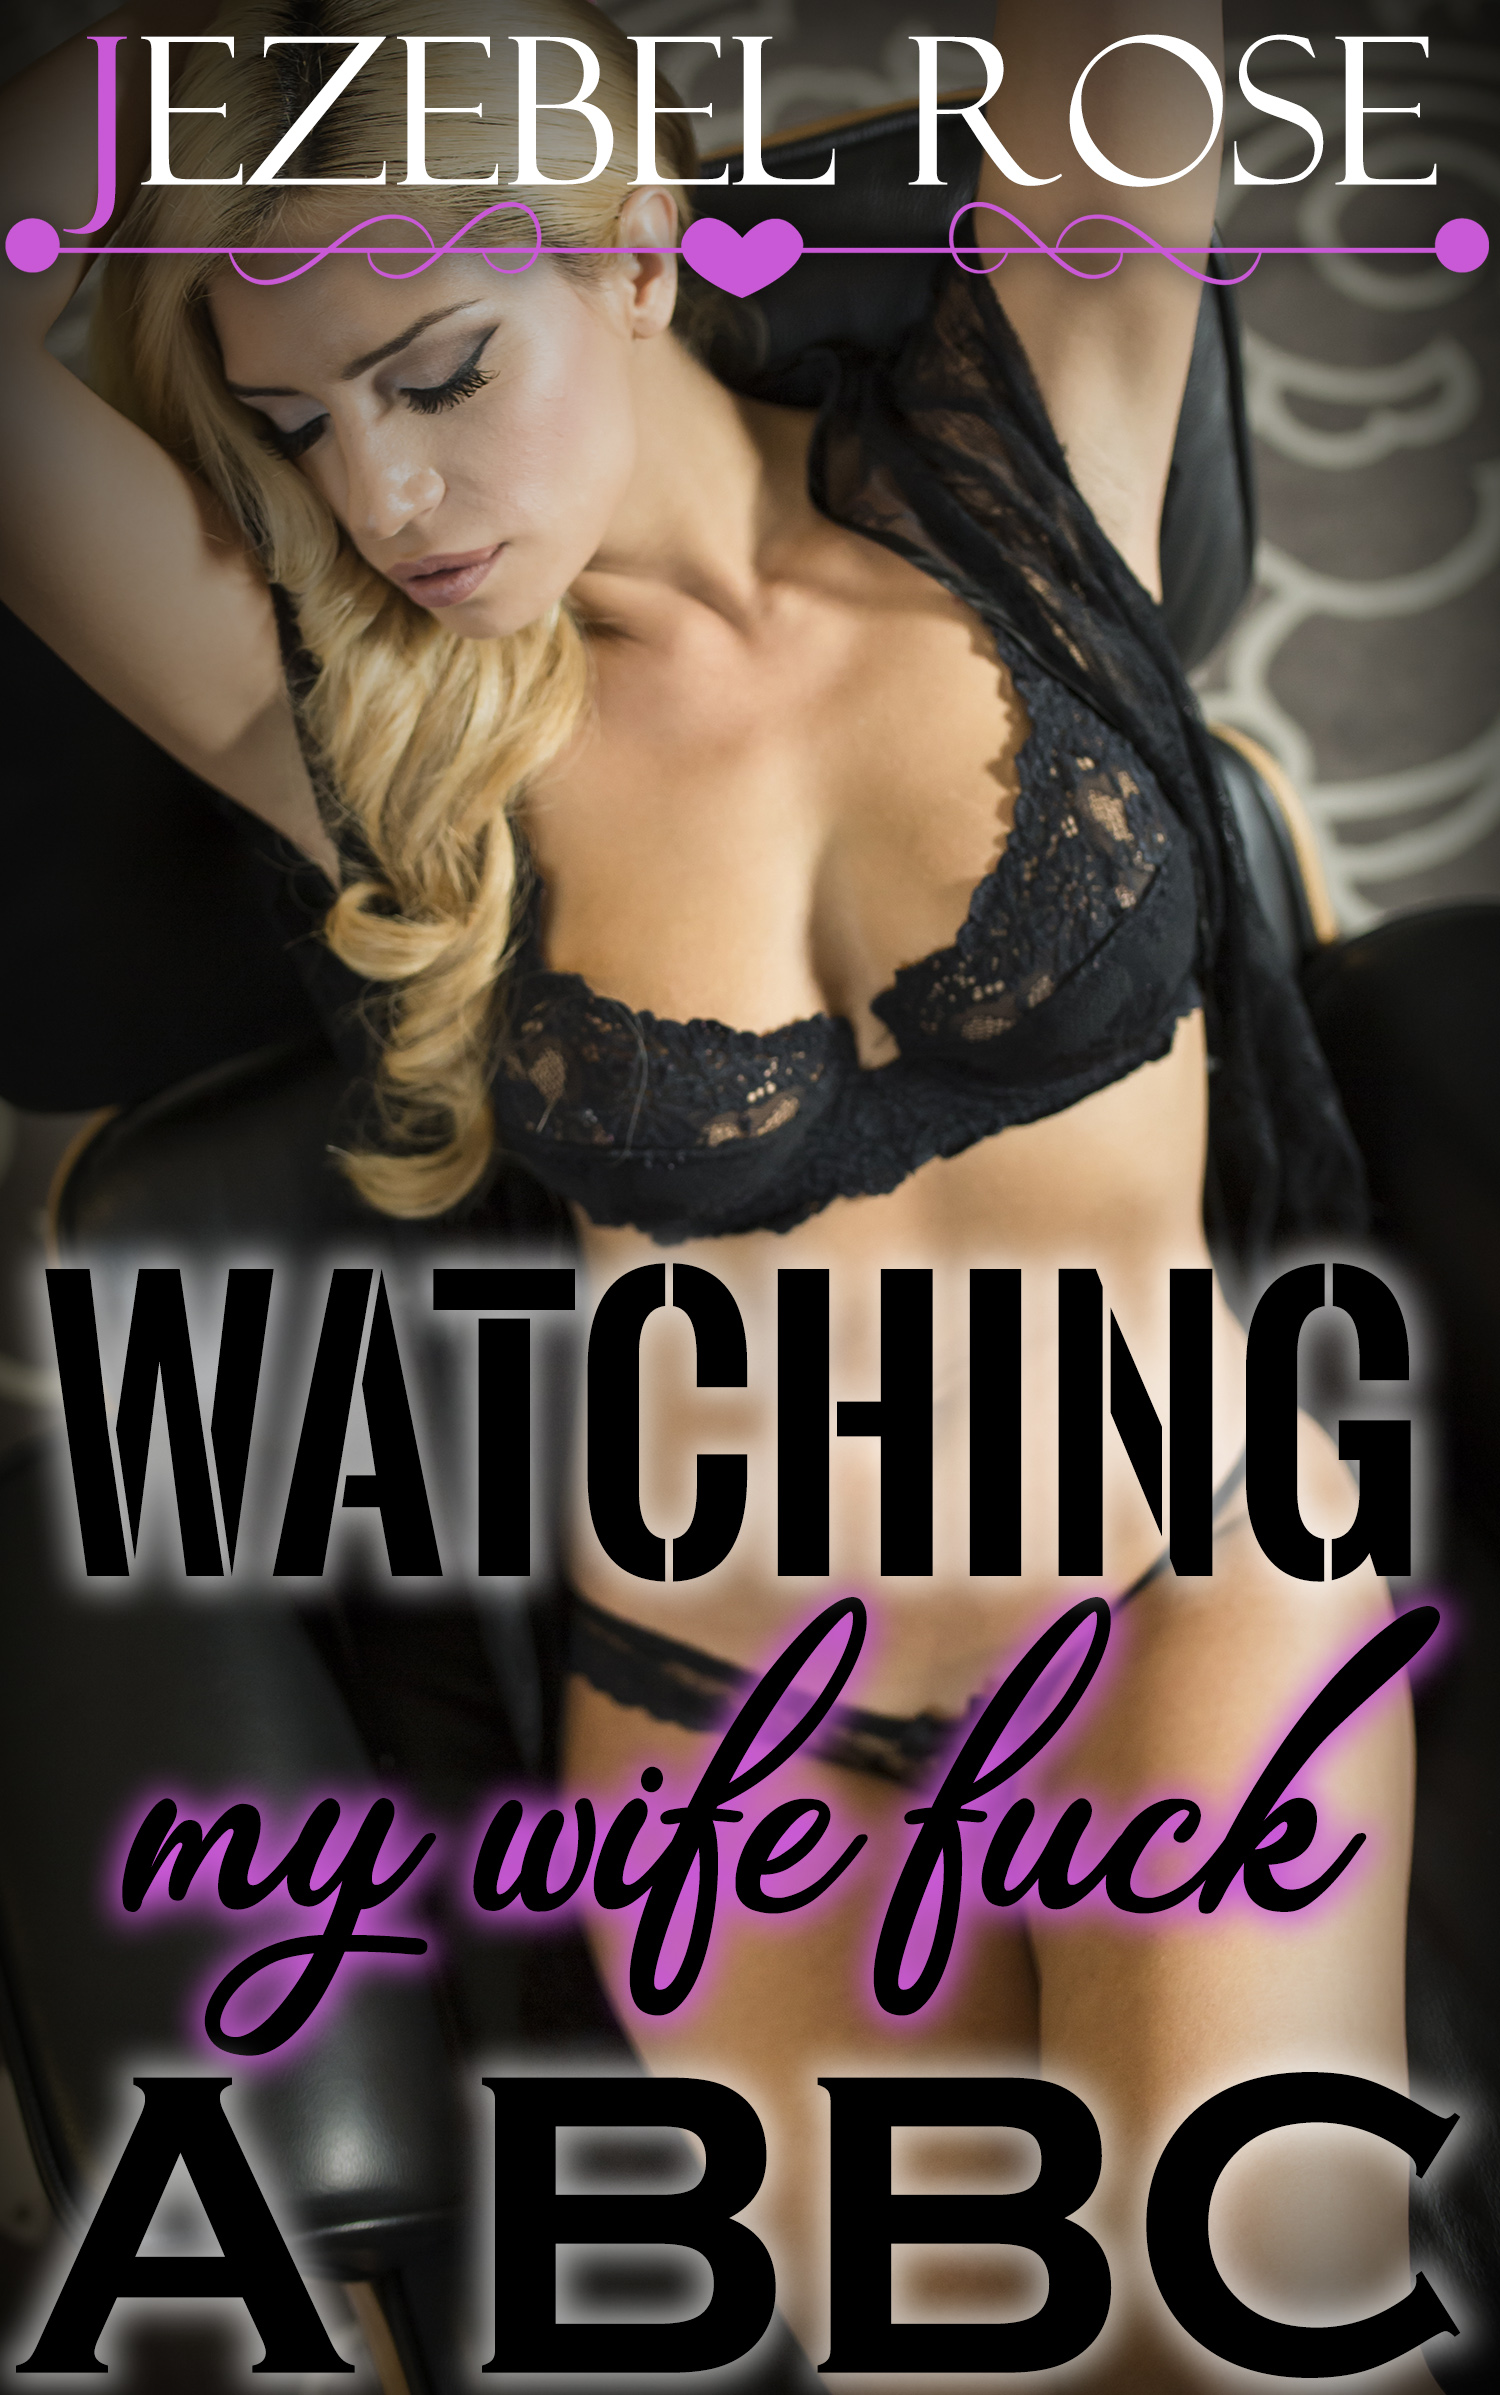 Naked female actor porn